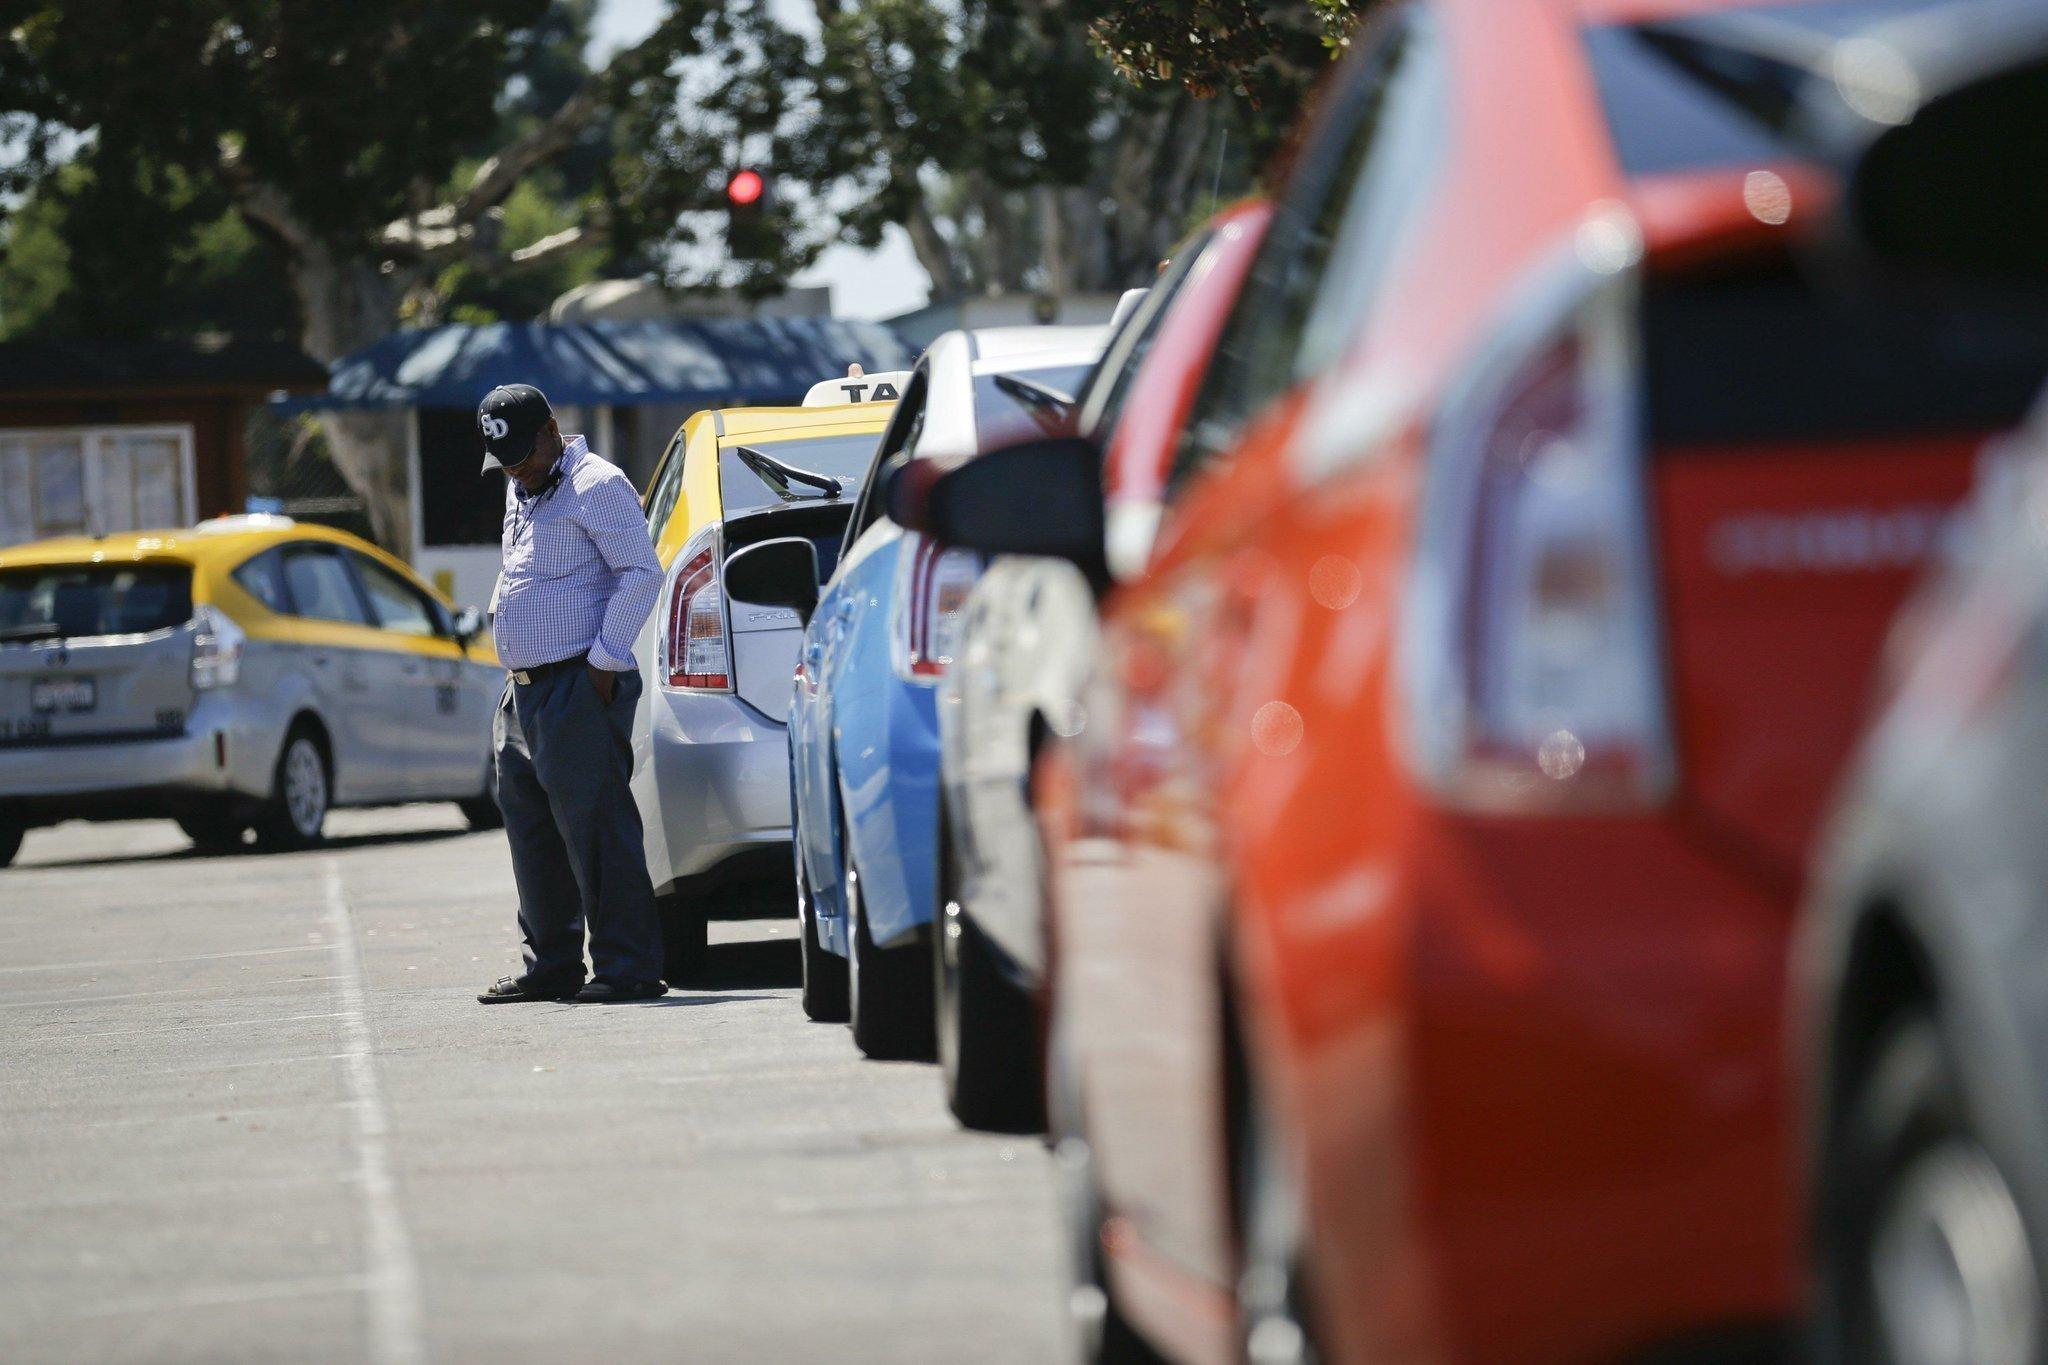 Hybrid Rebates Program Helps Taxi Companies Switch To Hybrids The San Diego